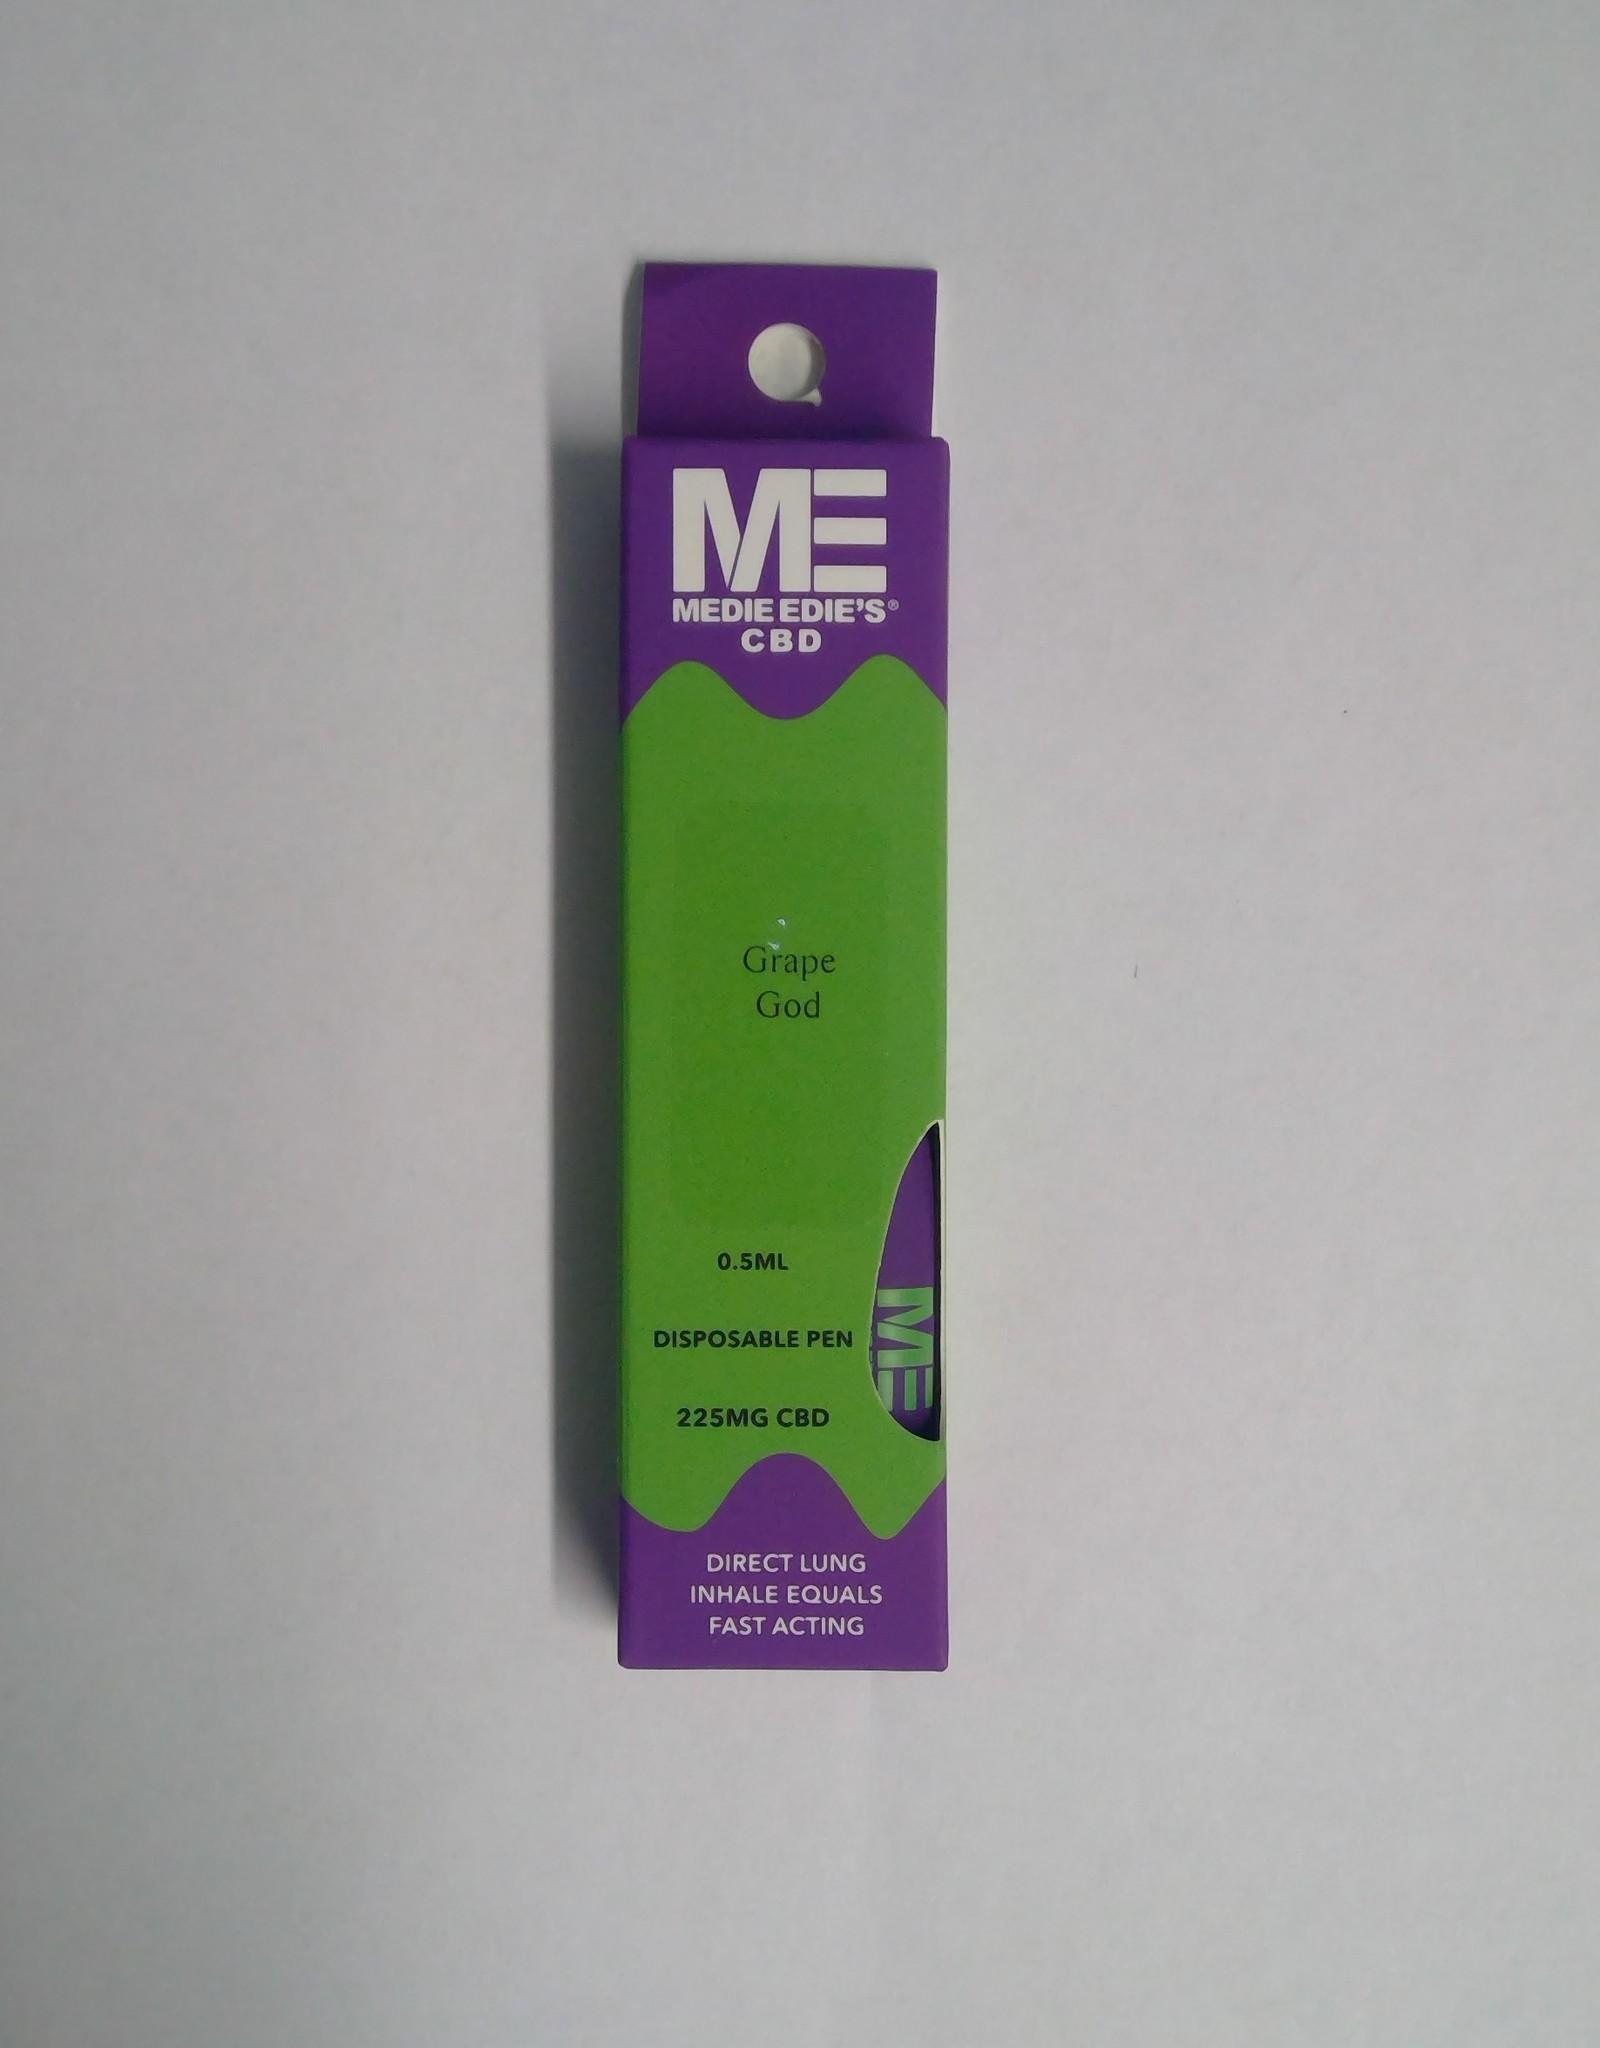 Medie Edie's Grape God Disposable CBD Vape - 225mg - 0.5mL